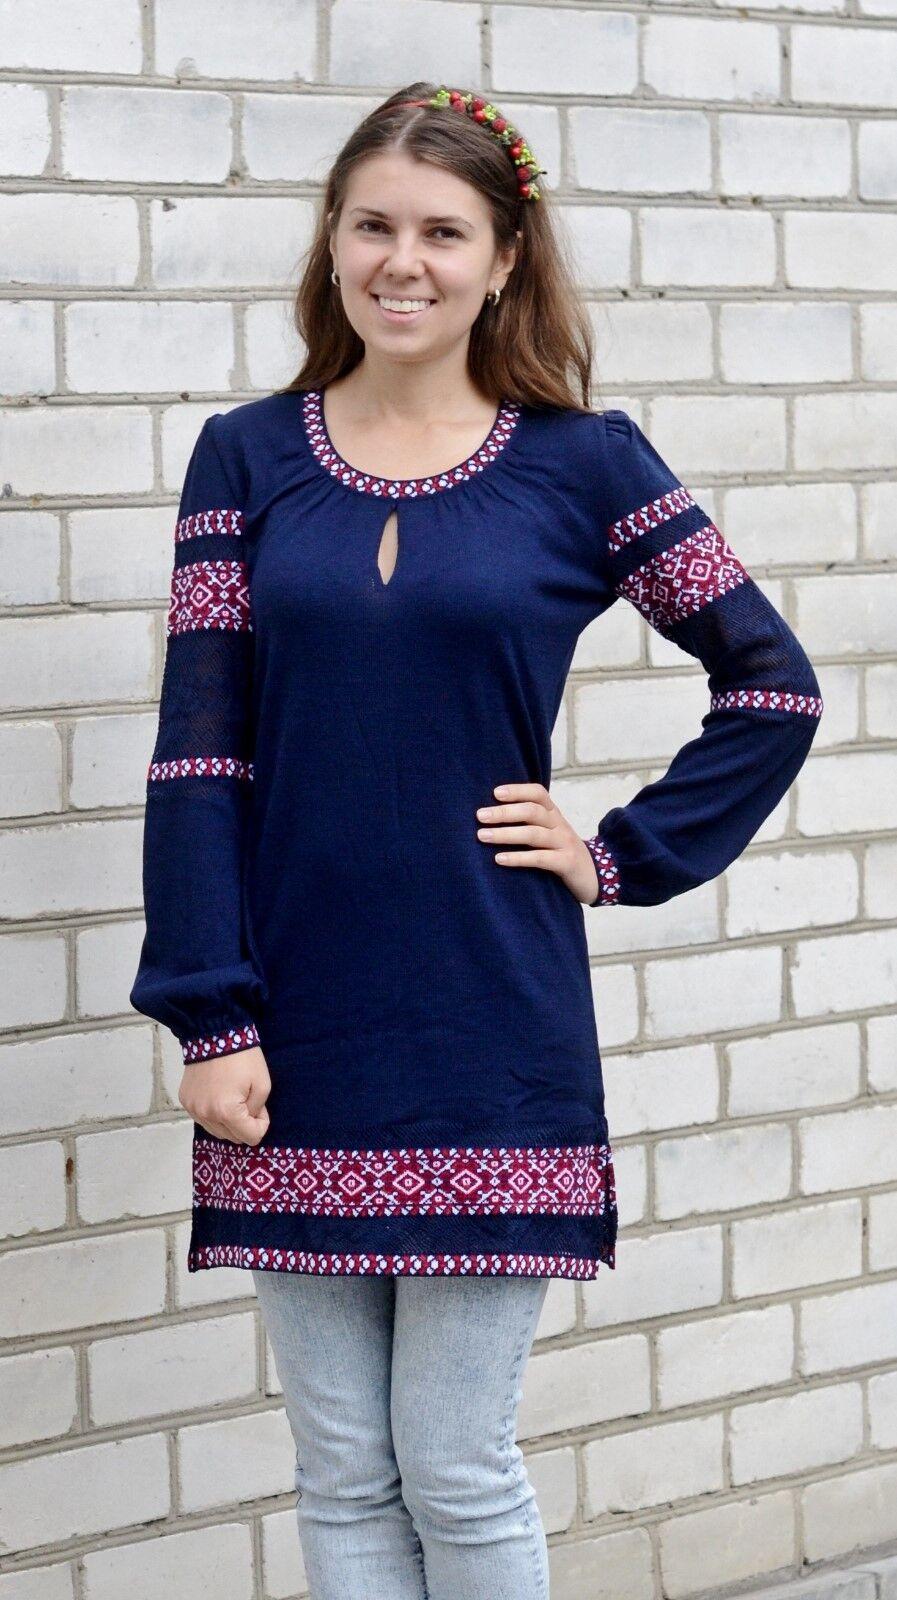 Ukrainian Women's Tunic Embroidery Vyshyvanka Textile